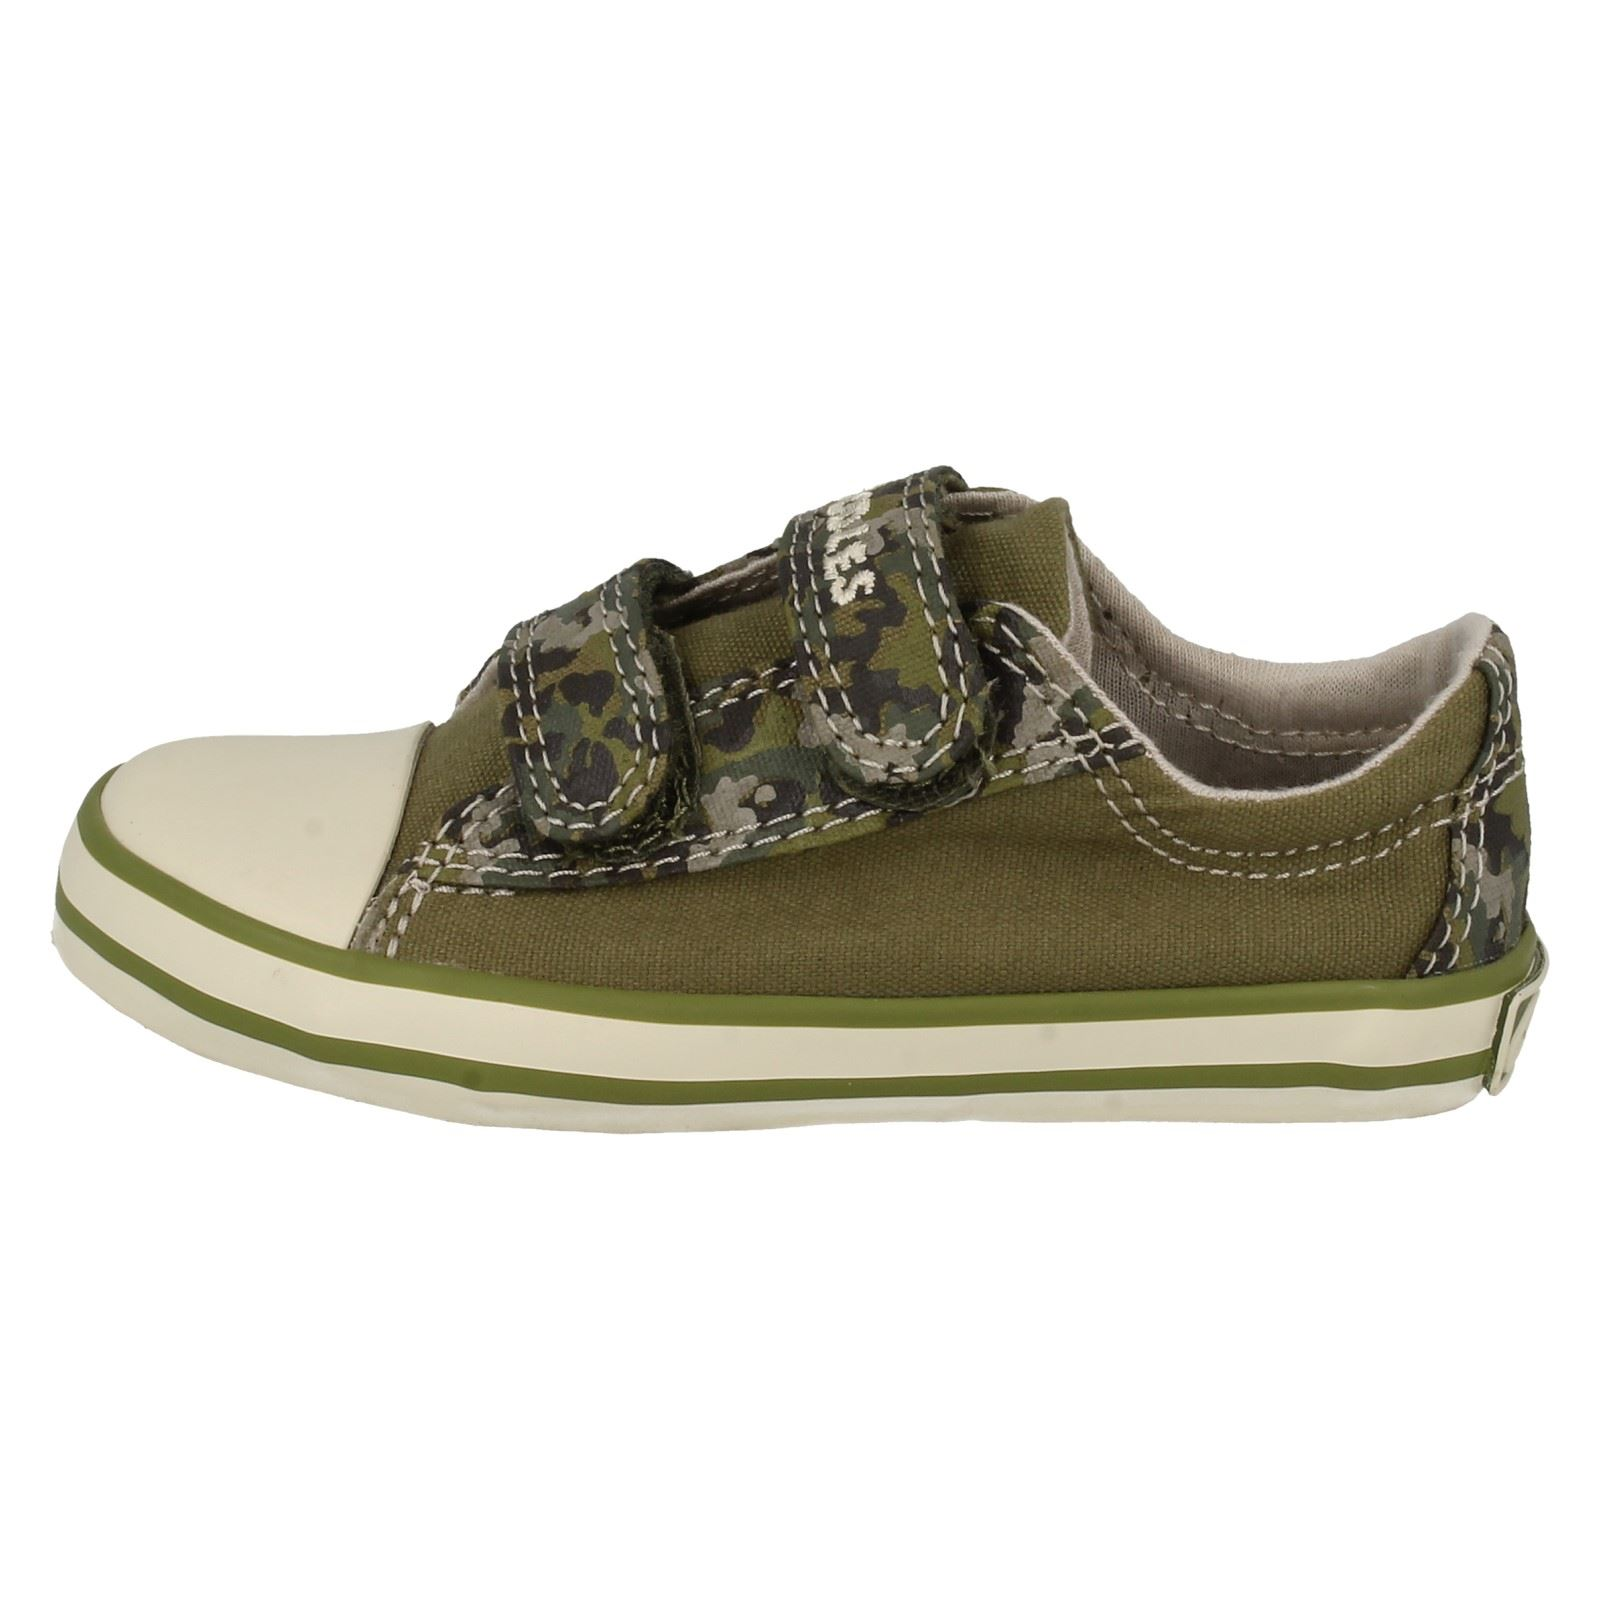 boys clarks canvas shoes happy chap fst ebay